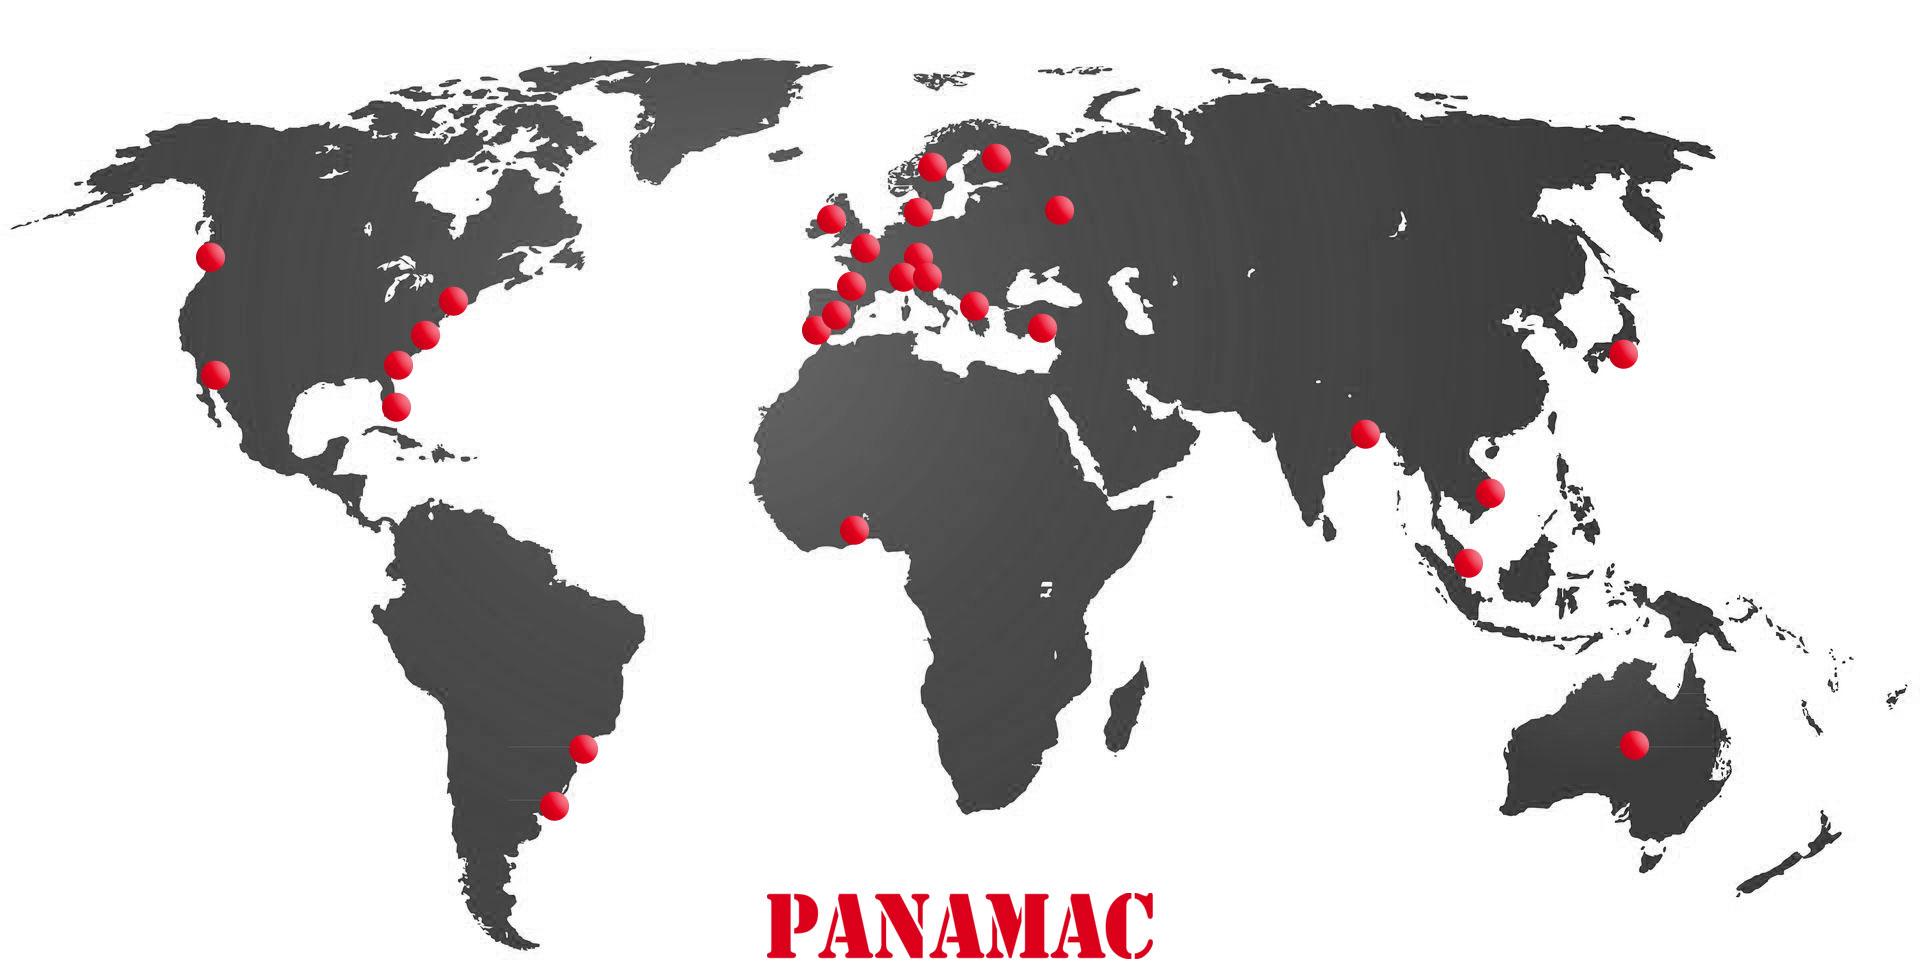 PANAMAC in the world